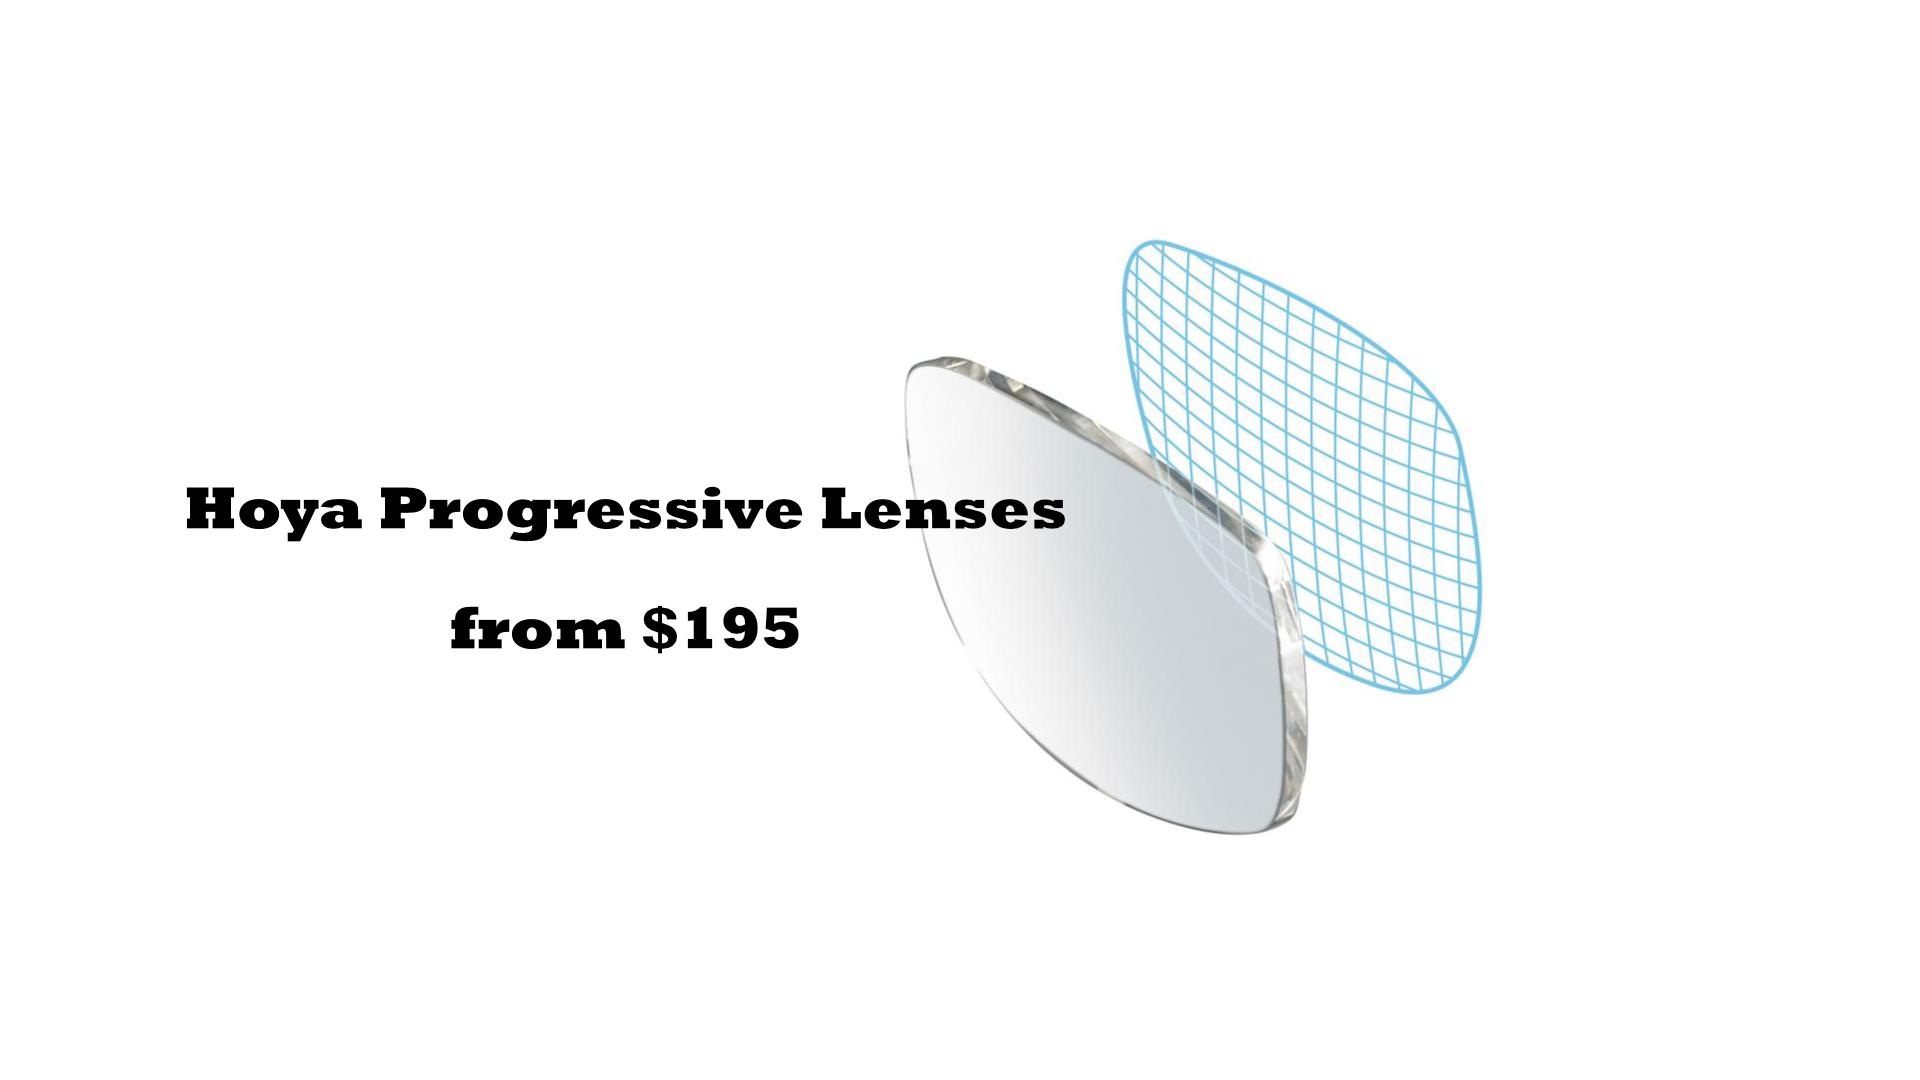 hoya progressive lens promo